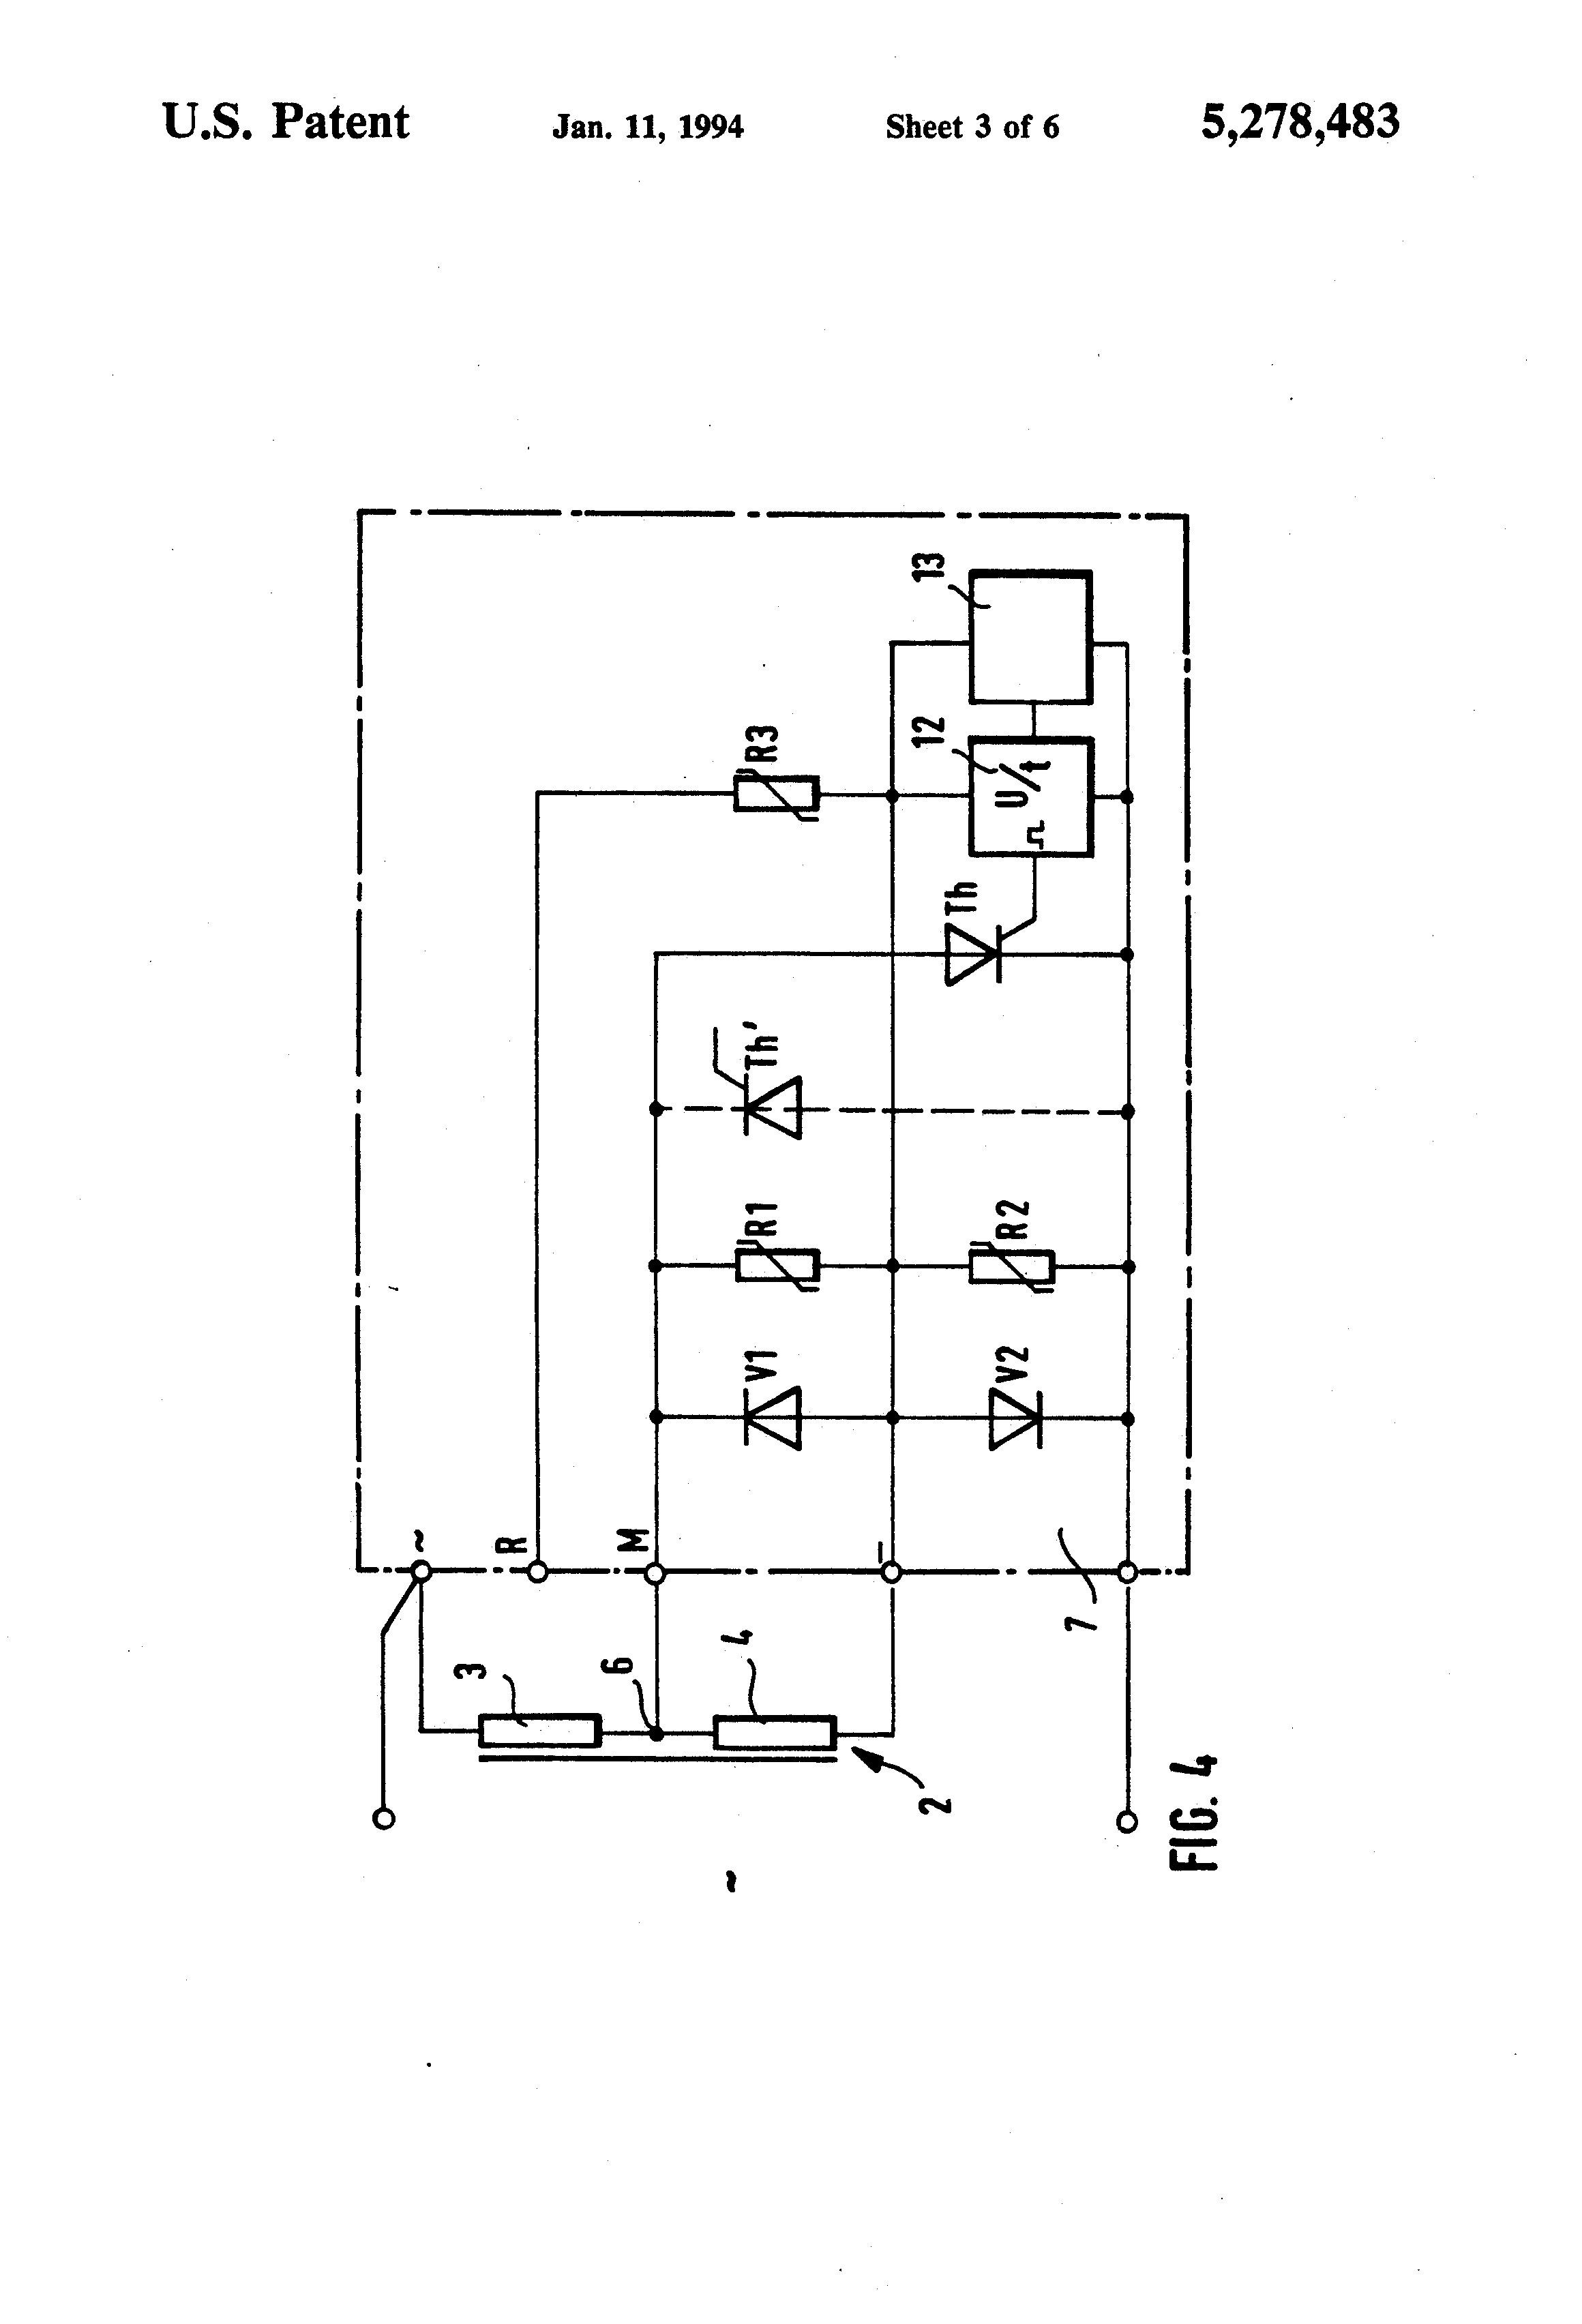 Sew Eurodrive 208 Volt Wiring Diagram - Wiring Data